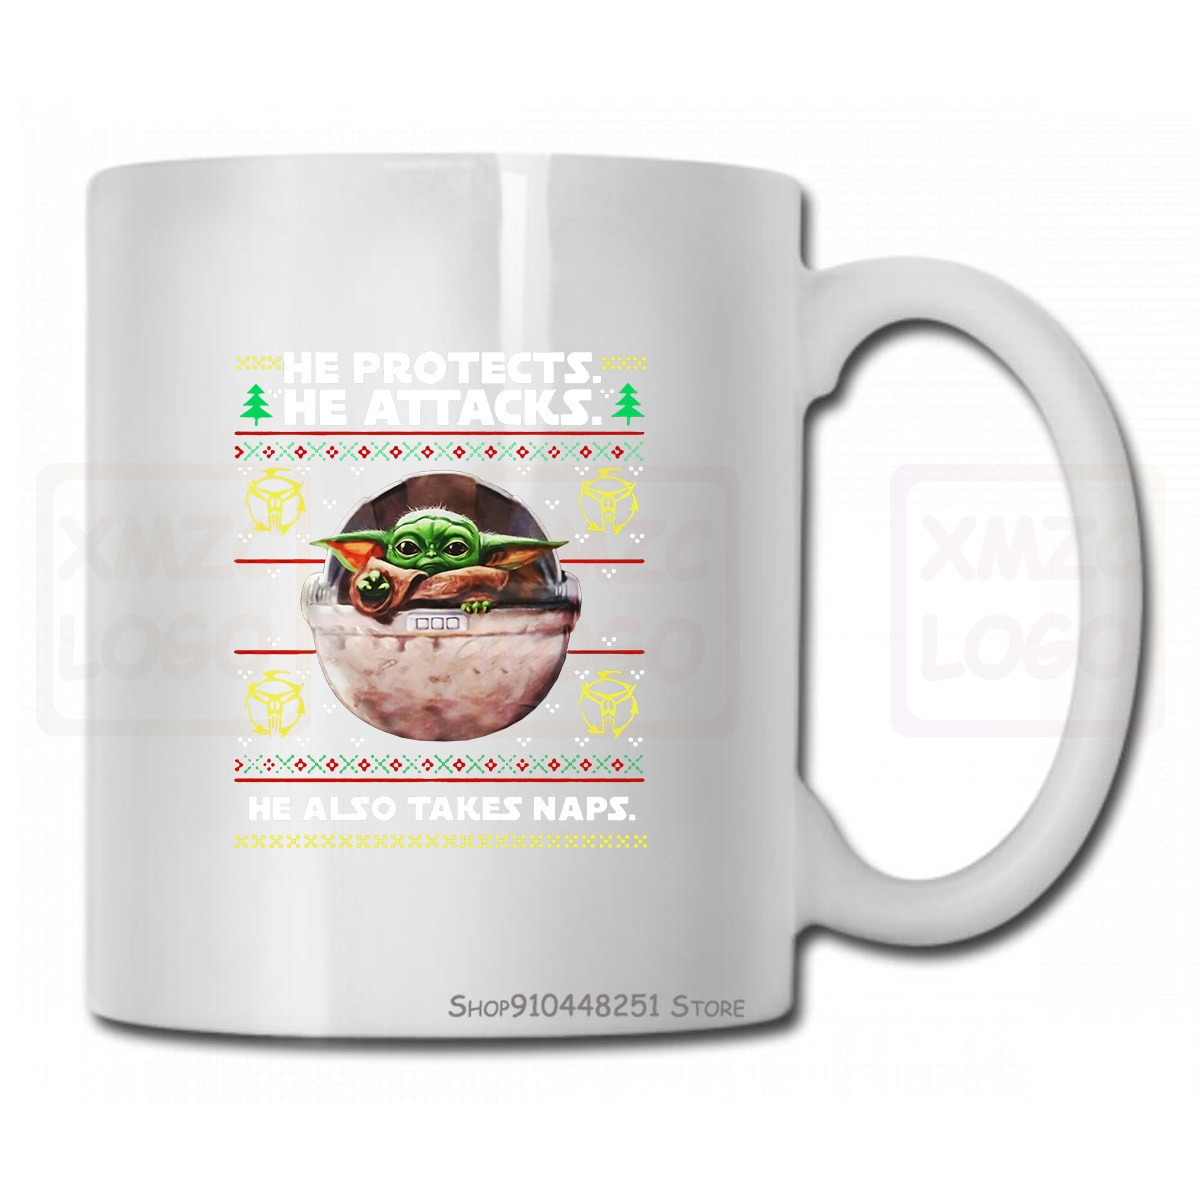 Мини герой Томас Танк Engineantman кружка чашка для женщин и мужчин